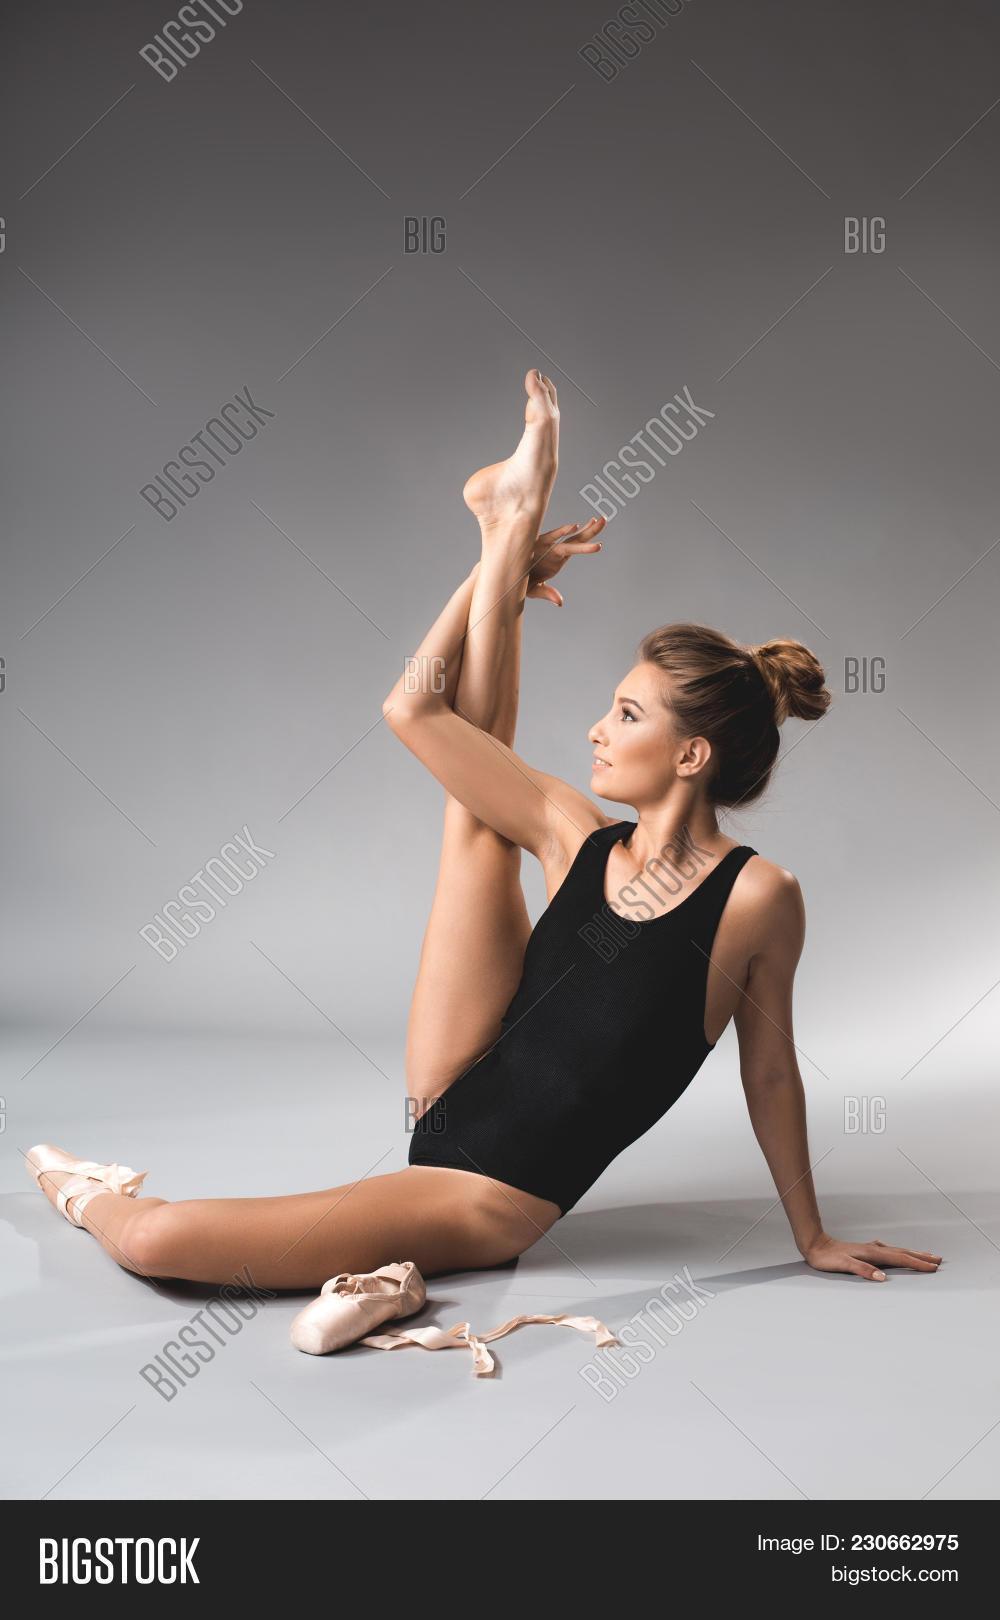 cfeed51f5 Ballerina Leotard Image   Photo (Free Trial)